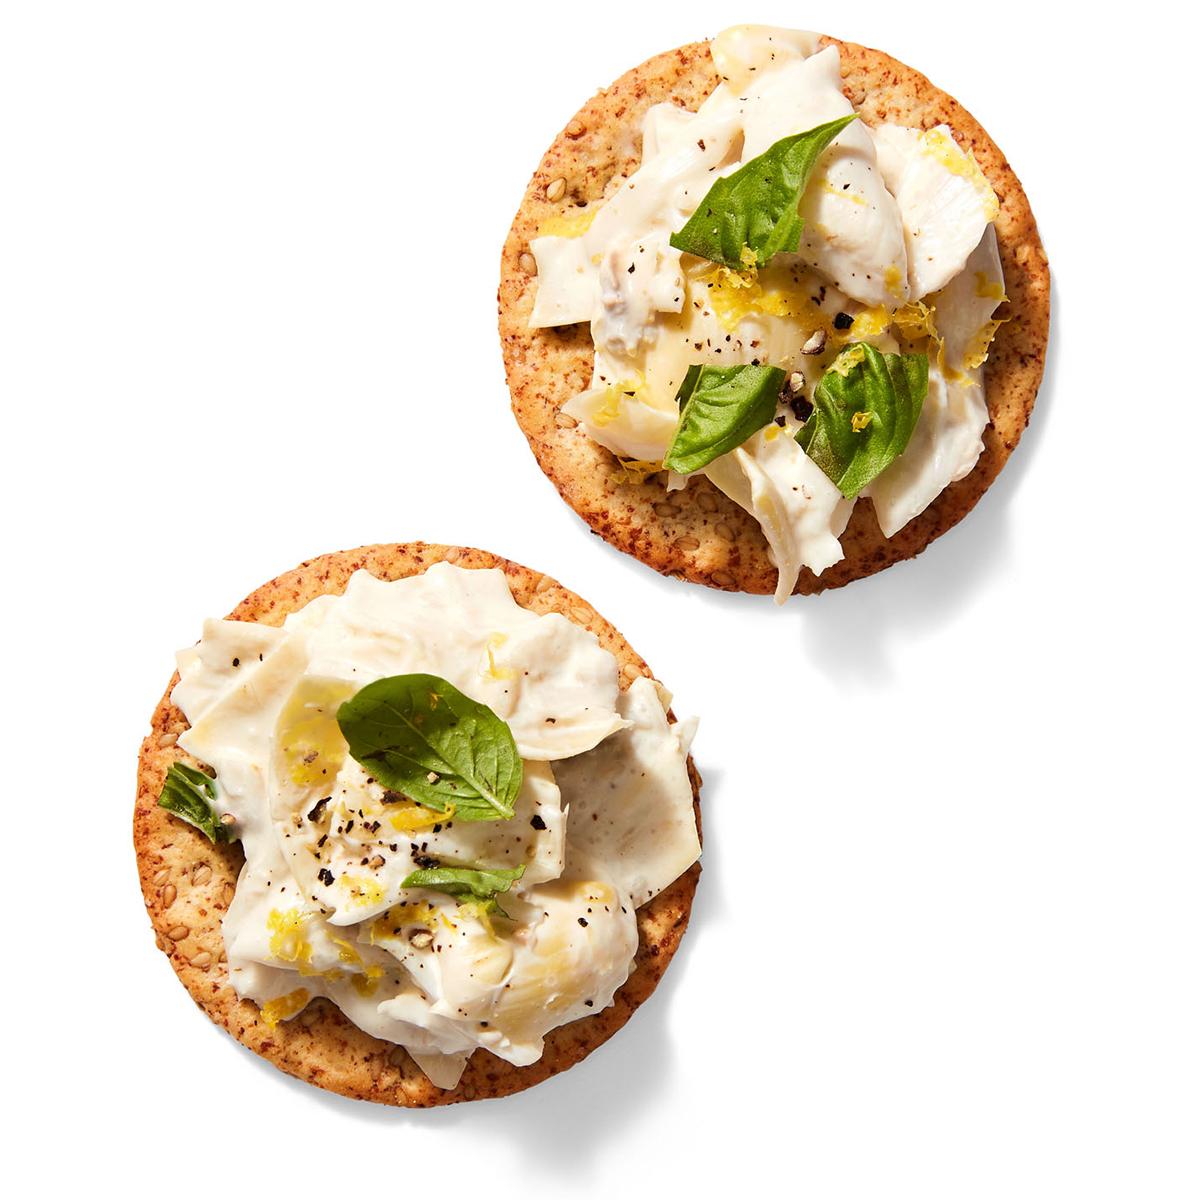 Creamy Crab & Artichoke Bites